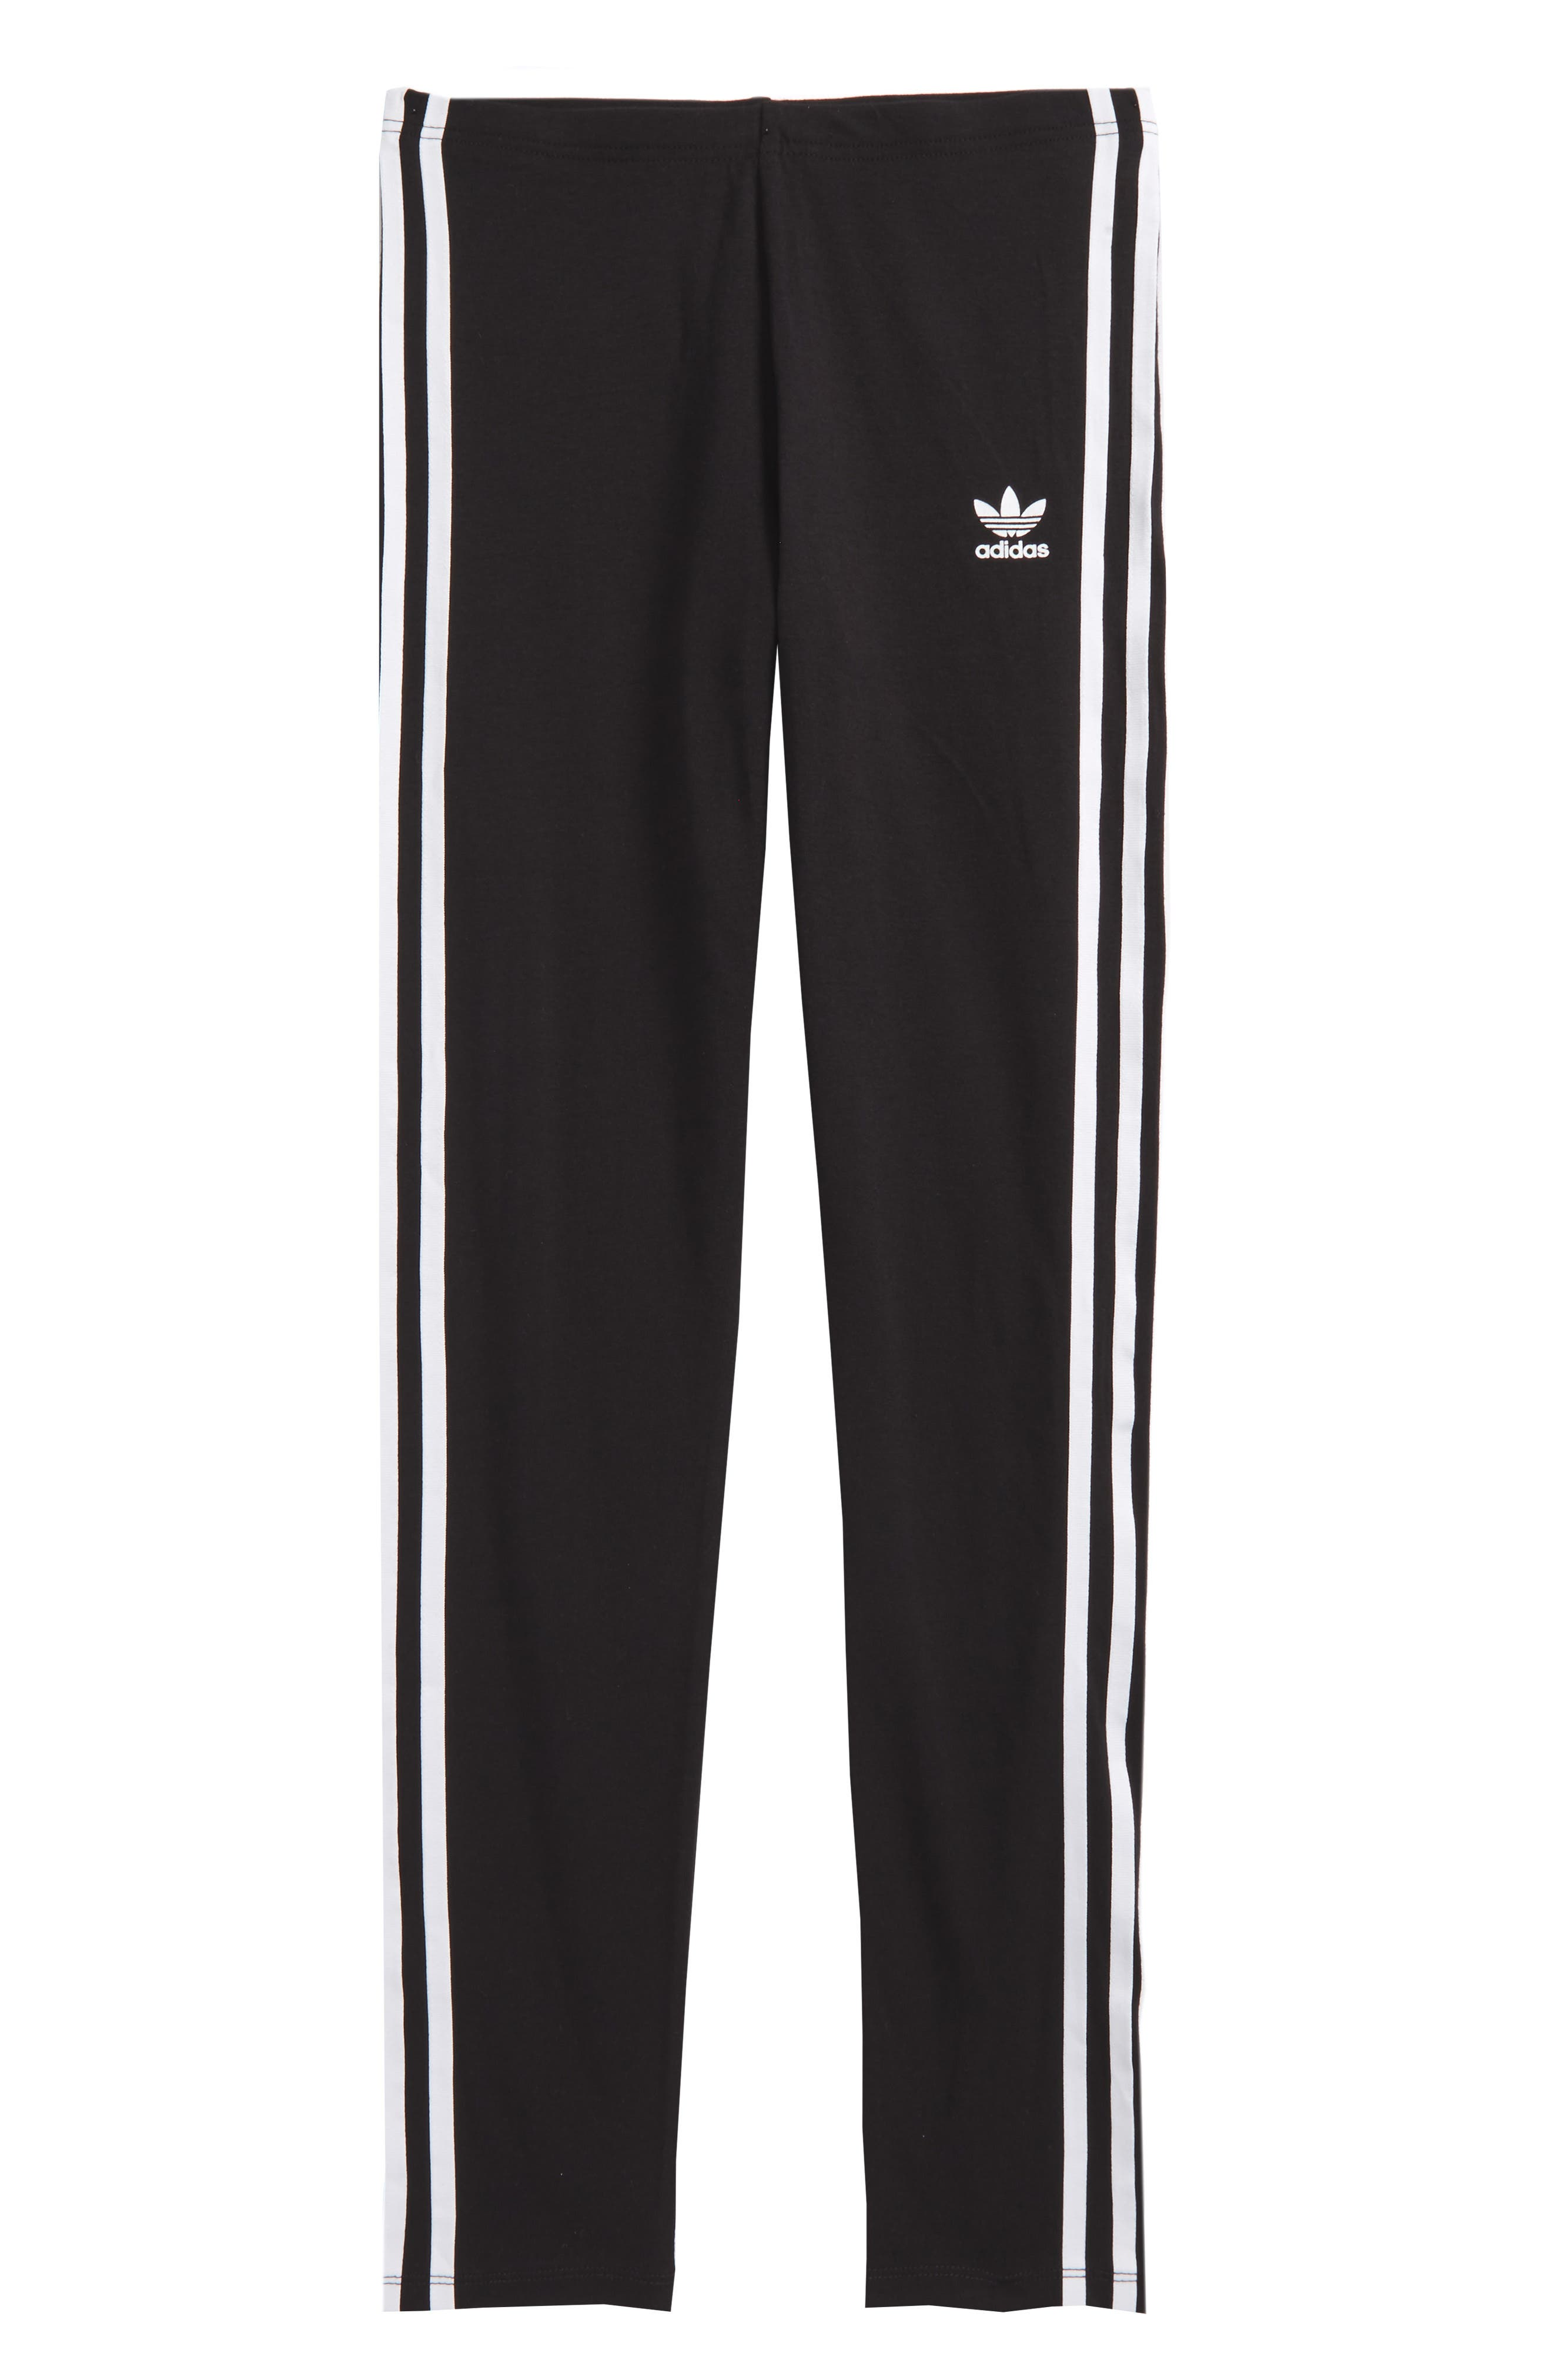 ADIDAS ORIGINALS adidas 3-Stripes Leggings, Main, color, BLACK/ WHITE